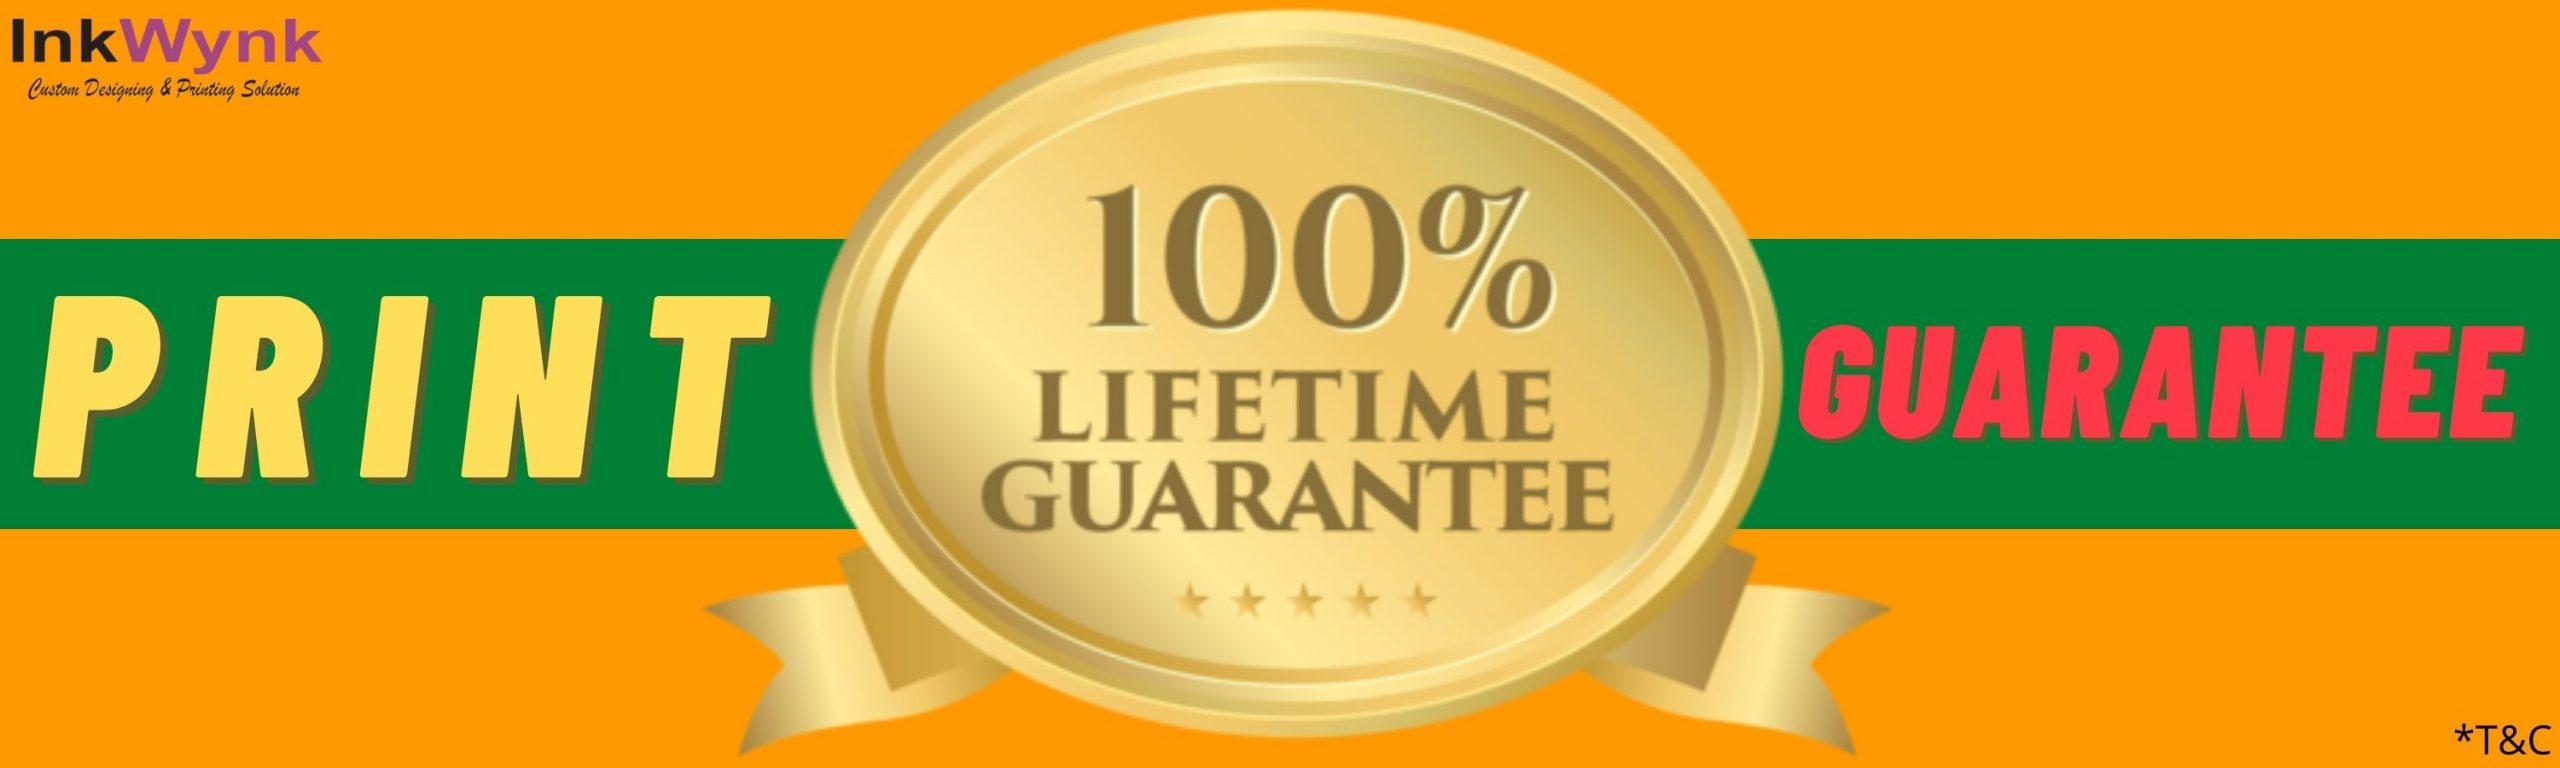 lifetime print guarantee